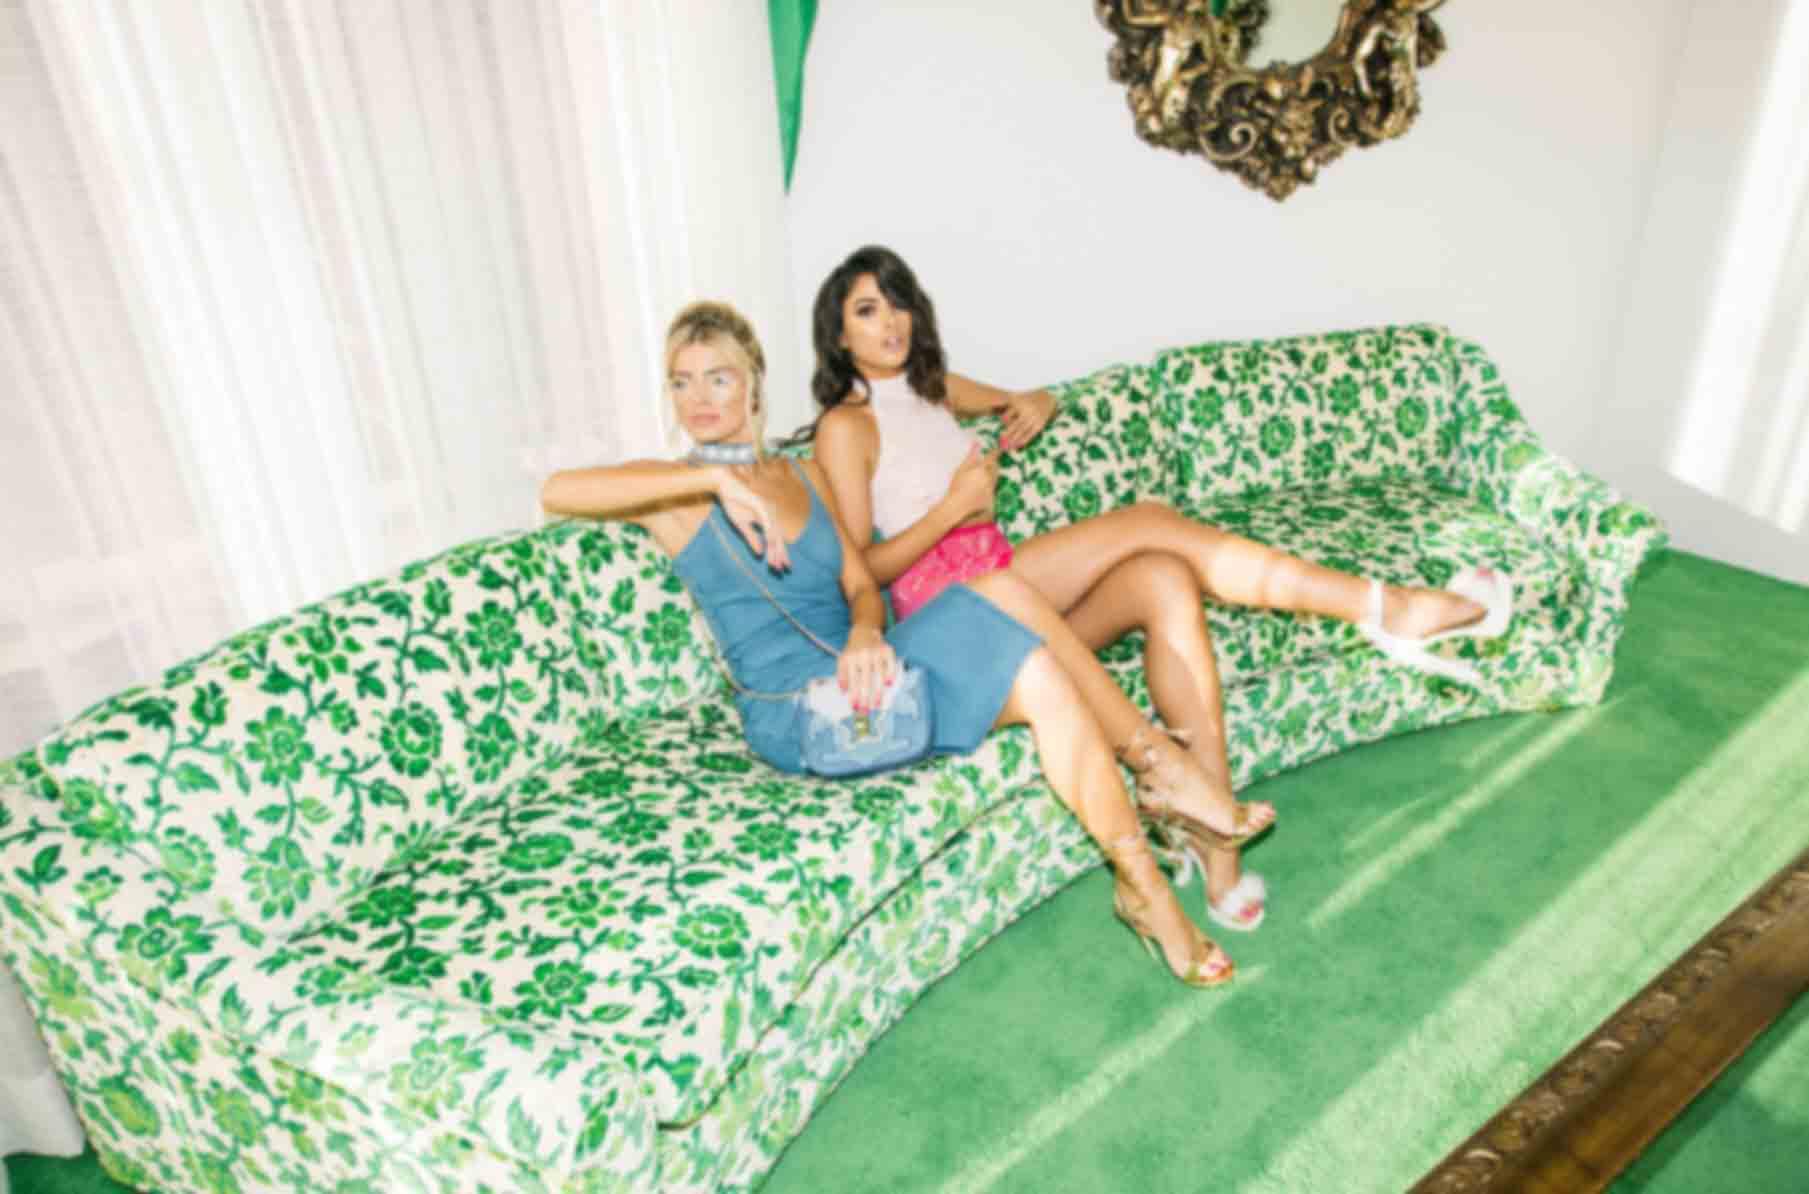 Amalia Blue Strappy Cami Denim Dress, Becky Denim Star Bag, Shea White Fluffy PU Platform Sandals